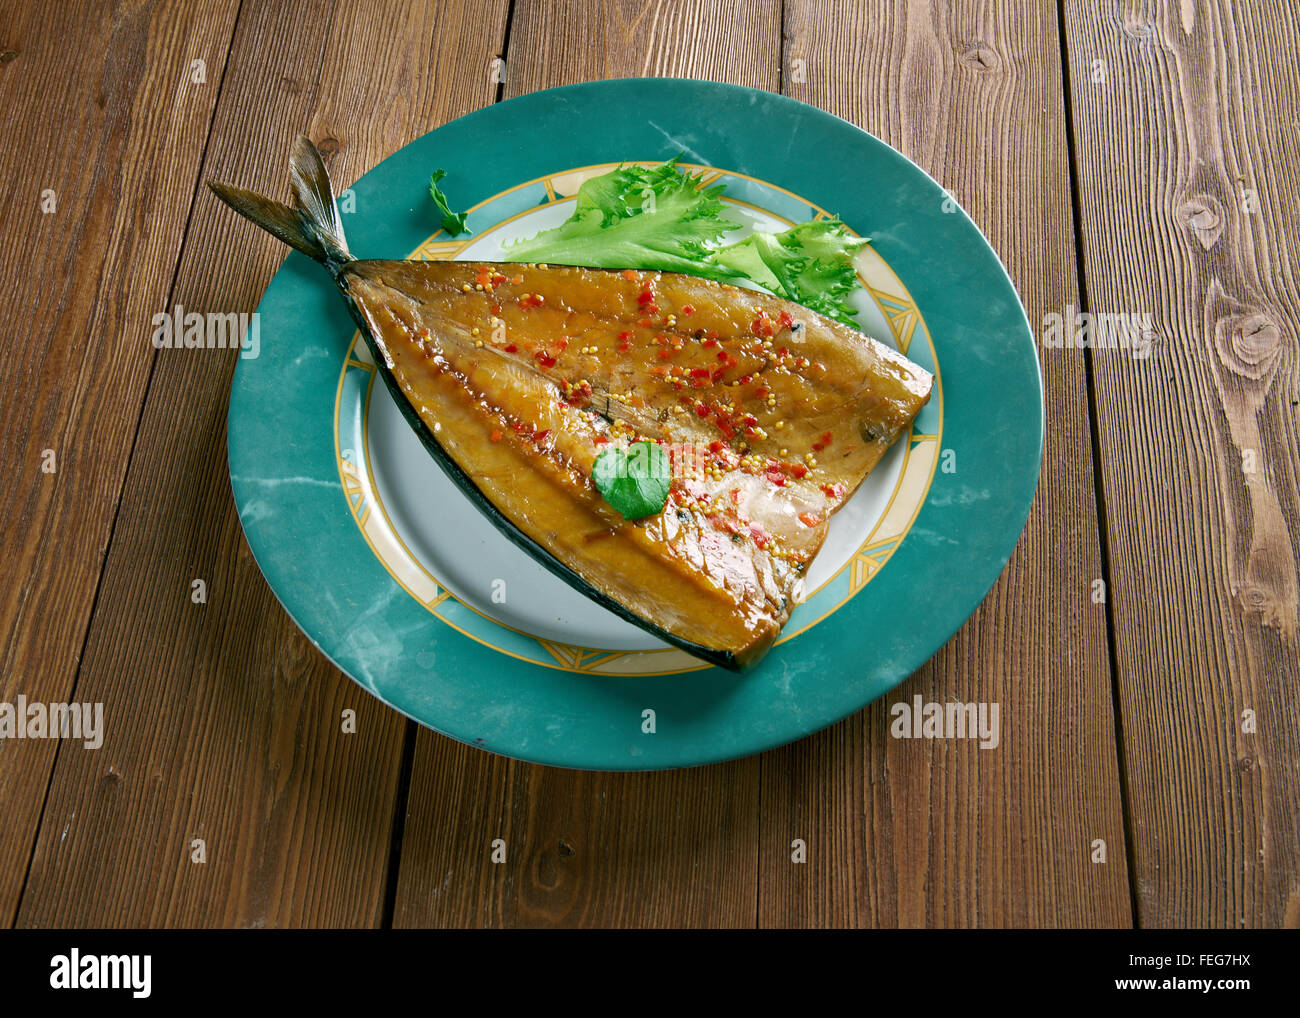 Craster kipper Deviled.smoked fish. Traditional British snack - Stock Image